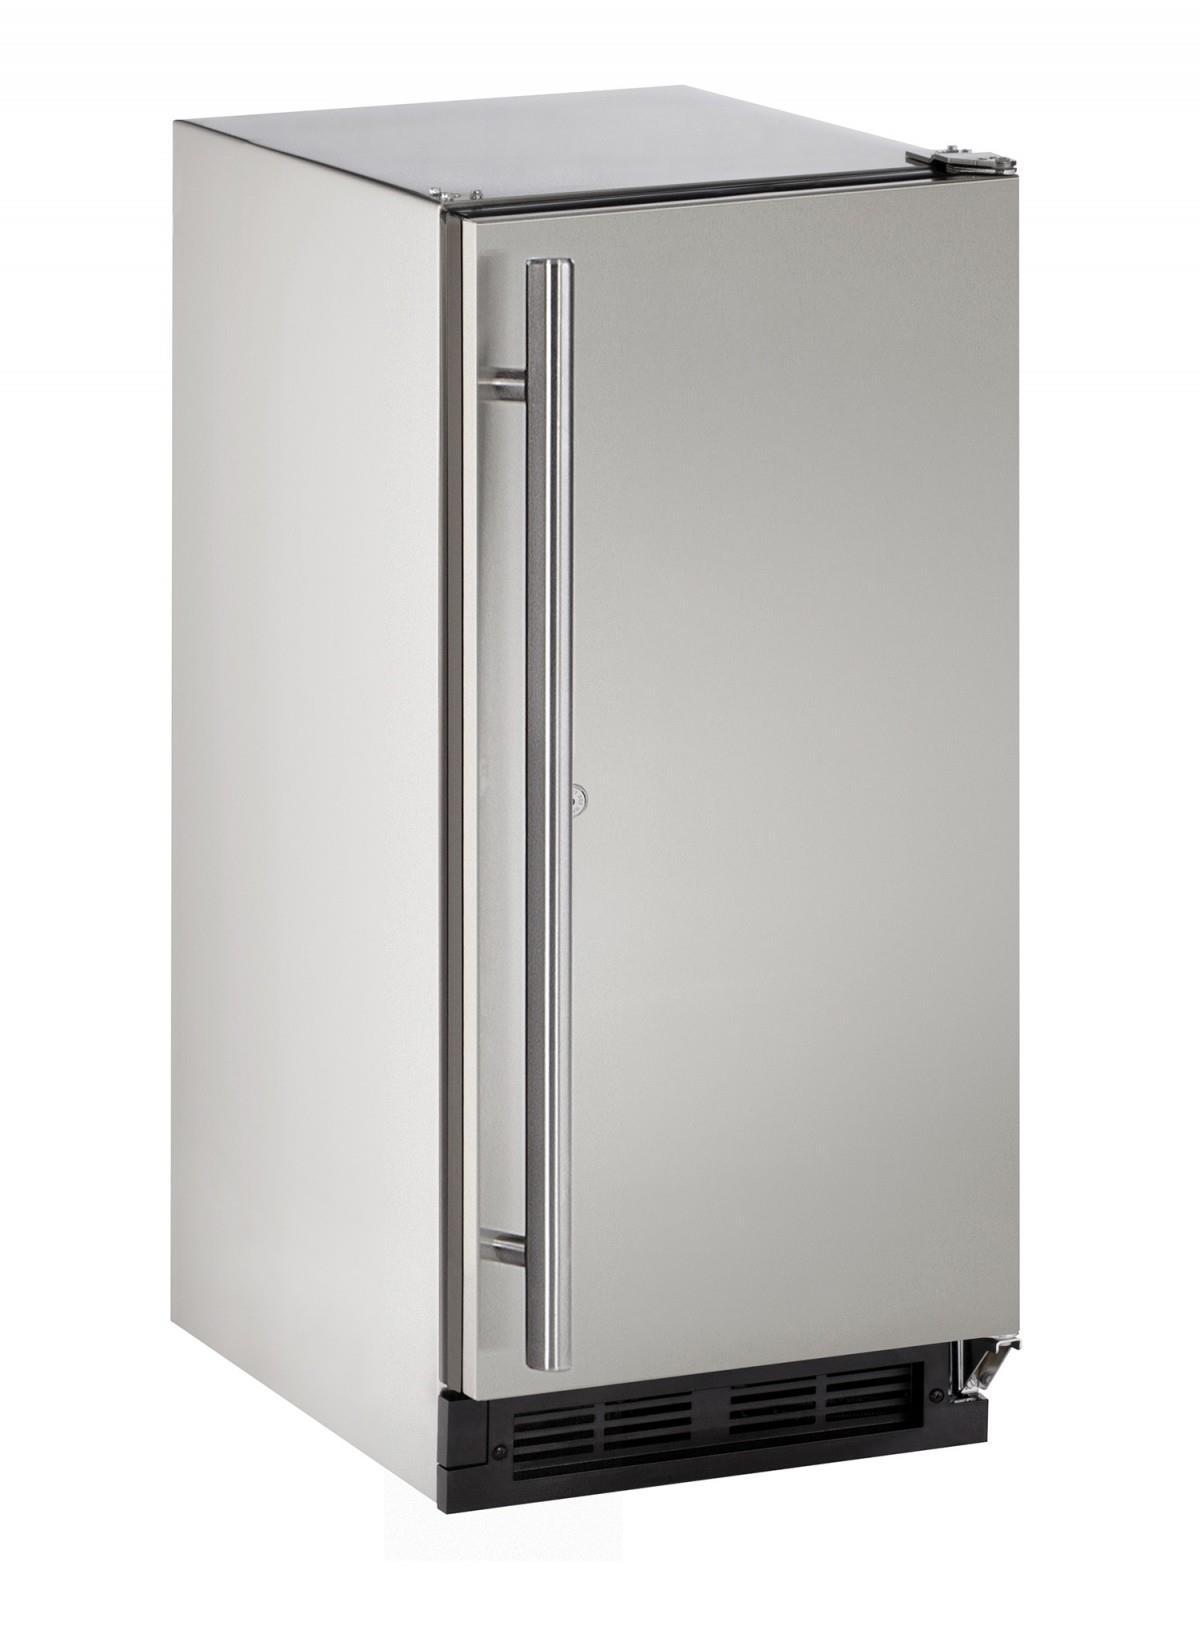 U-Line Refrigerators 2.9 Cu. Ft. Compact Outdoor Refrigerator - Item Number: U-1215RSOD-00A